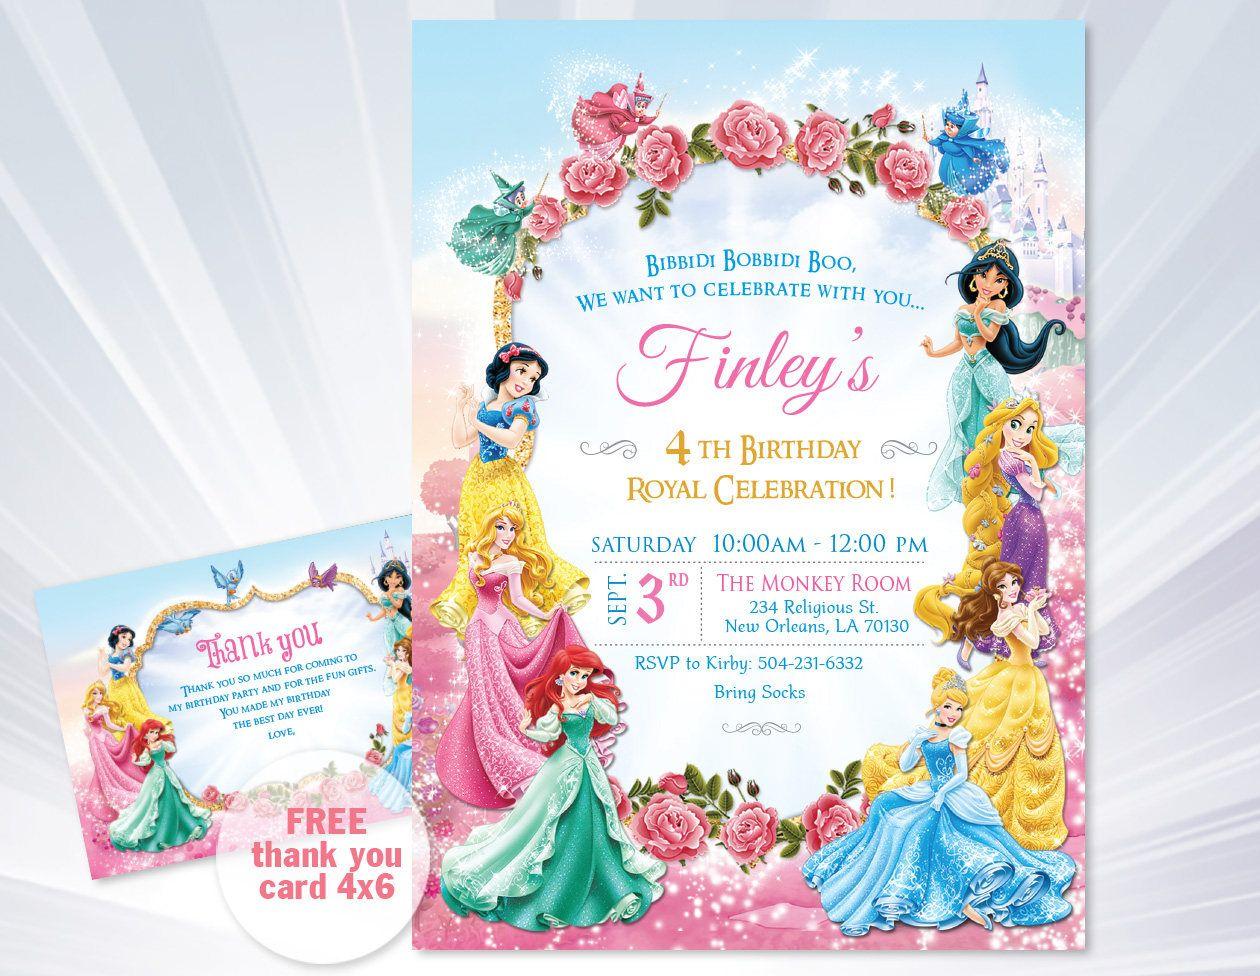 Princess Invitations Princess Birthday Party Invitations - Invitation birthday party girl